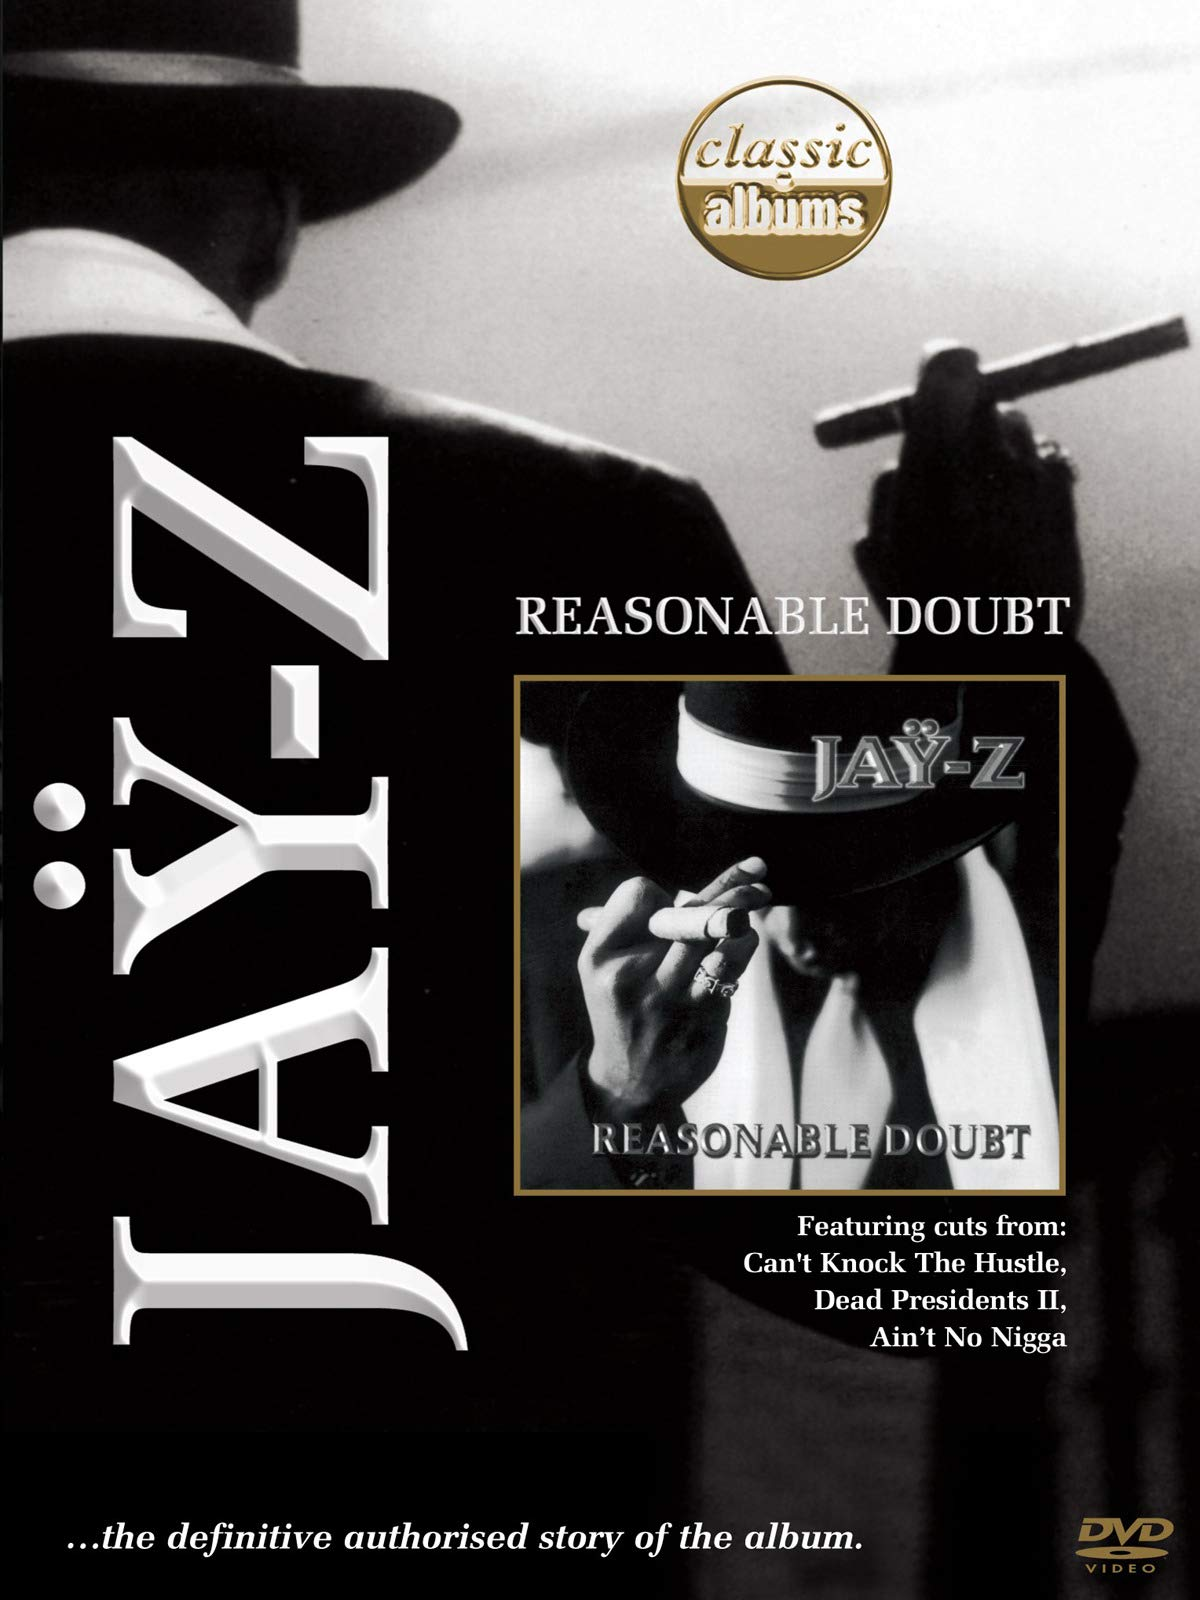 Jay-Z - Reasonable Doubt (Classic Album) on Amazon Prime Instant Video UK